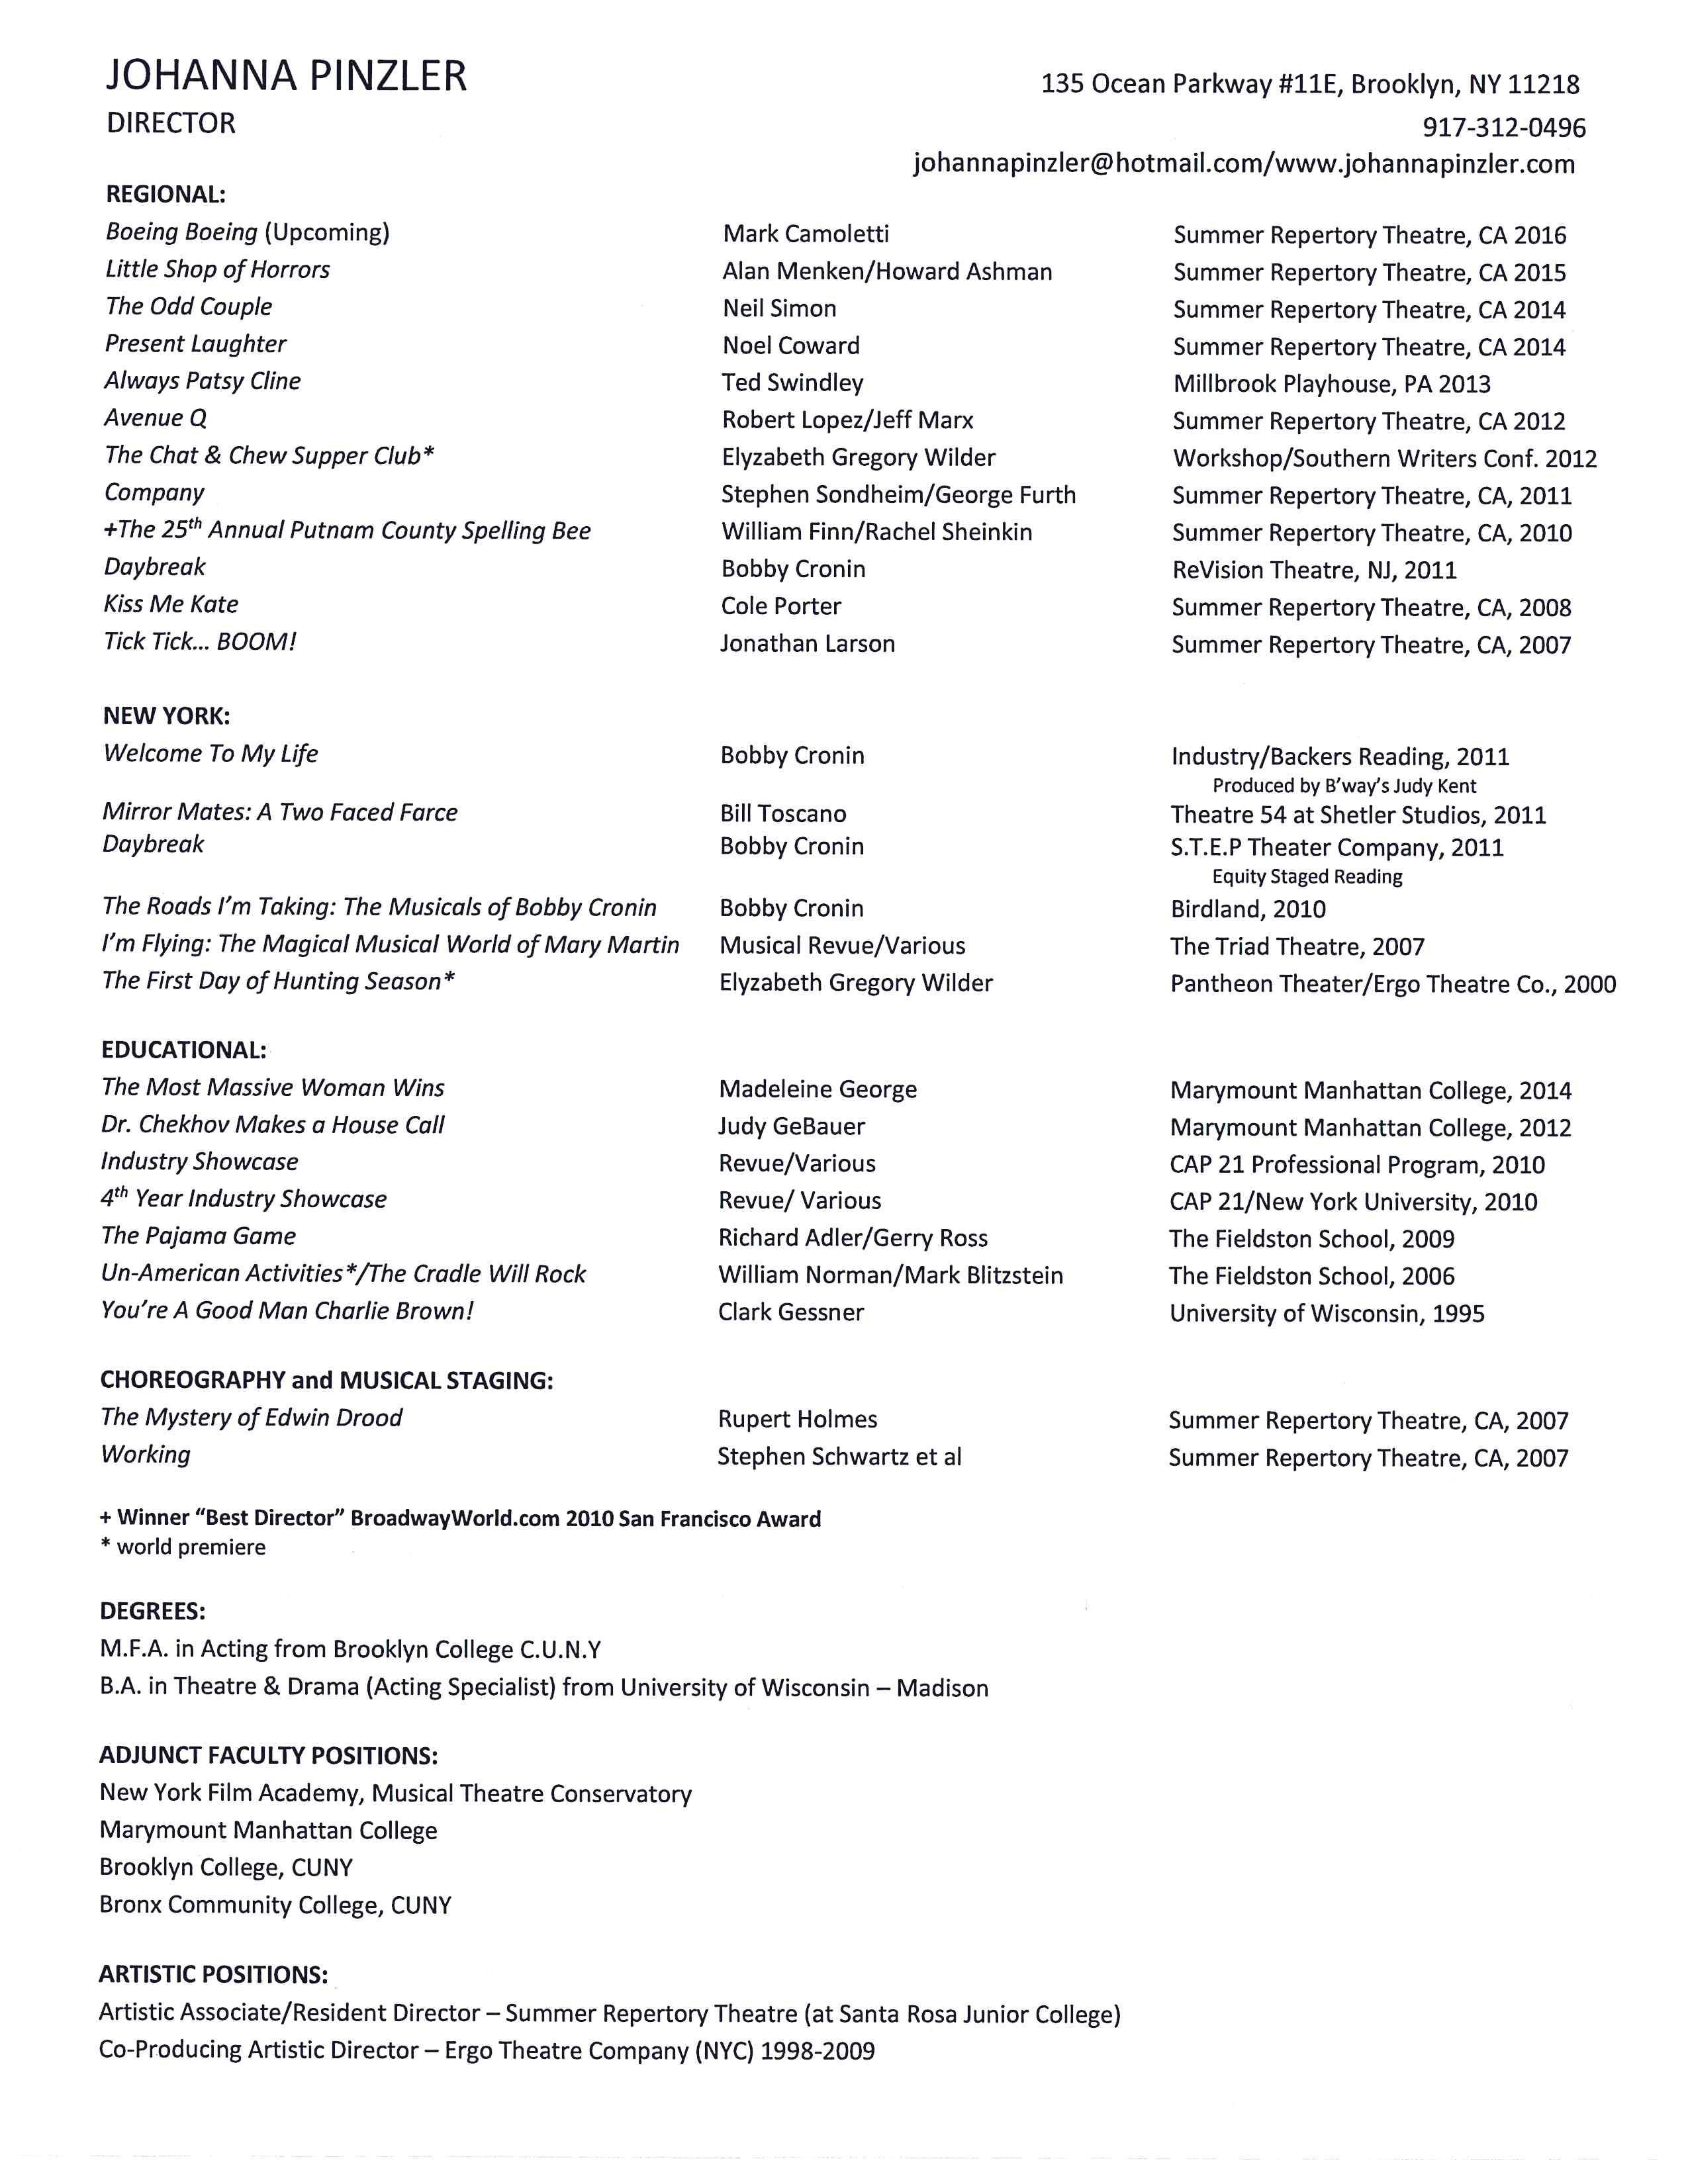 resume for artistic director cipanewsletter resume johanna pinzler